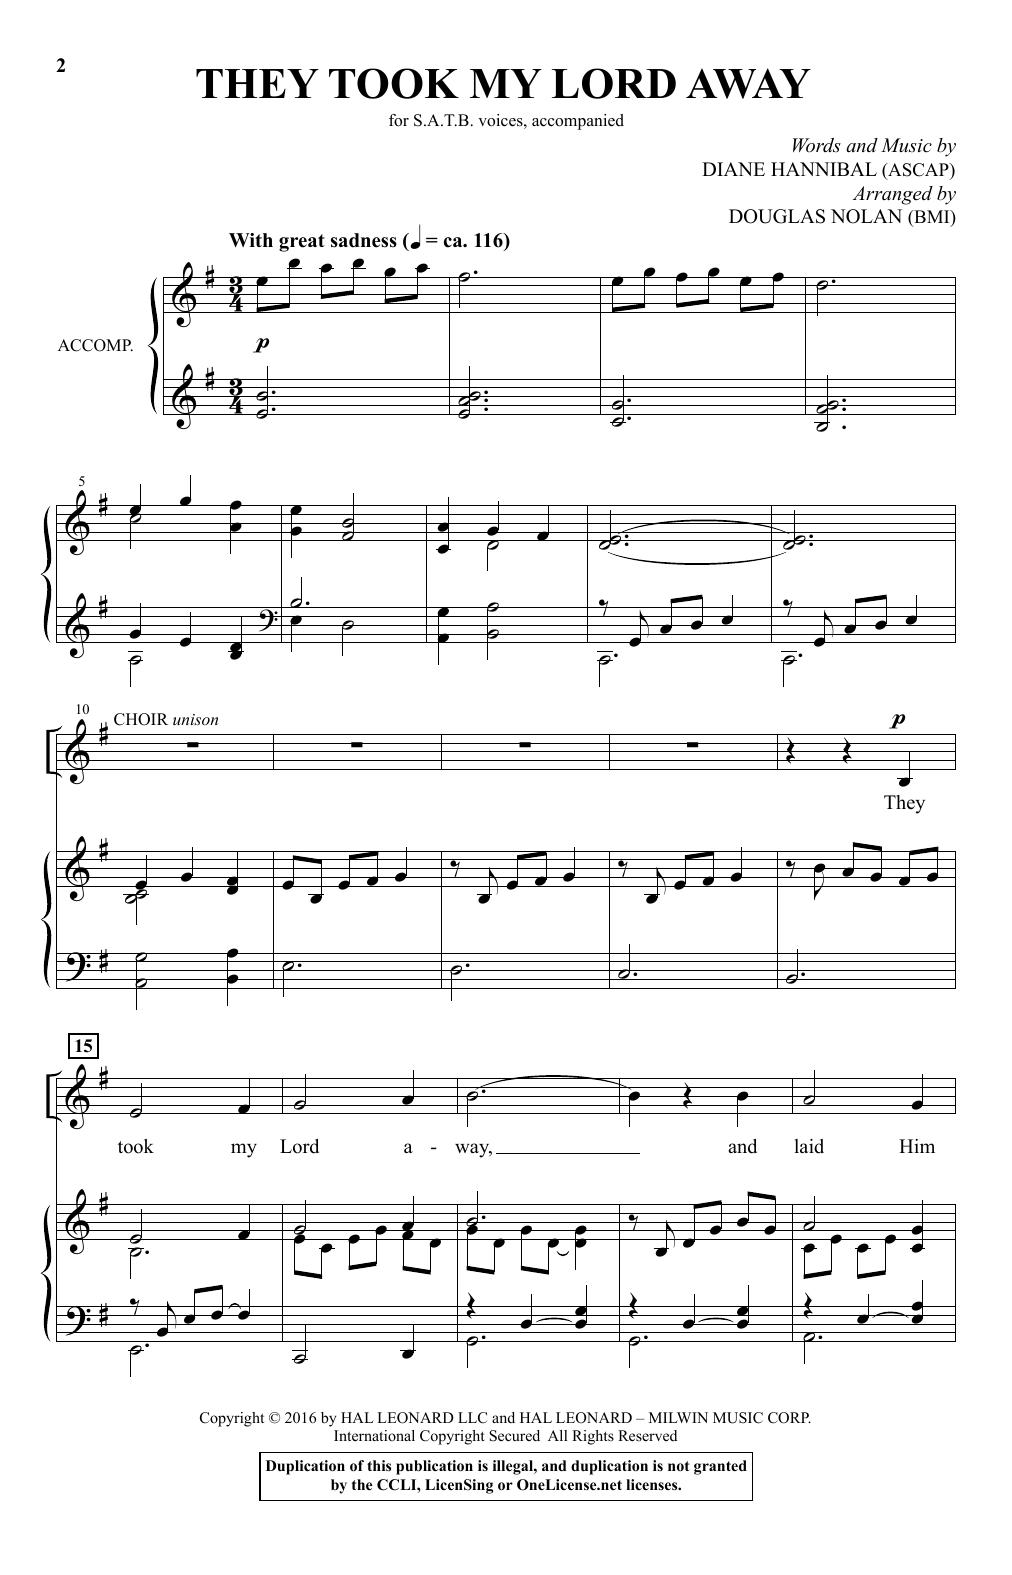 They Took My Lord Away (arr. Douglas Nolan) (SATB Choir)